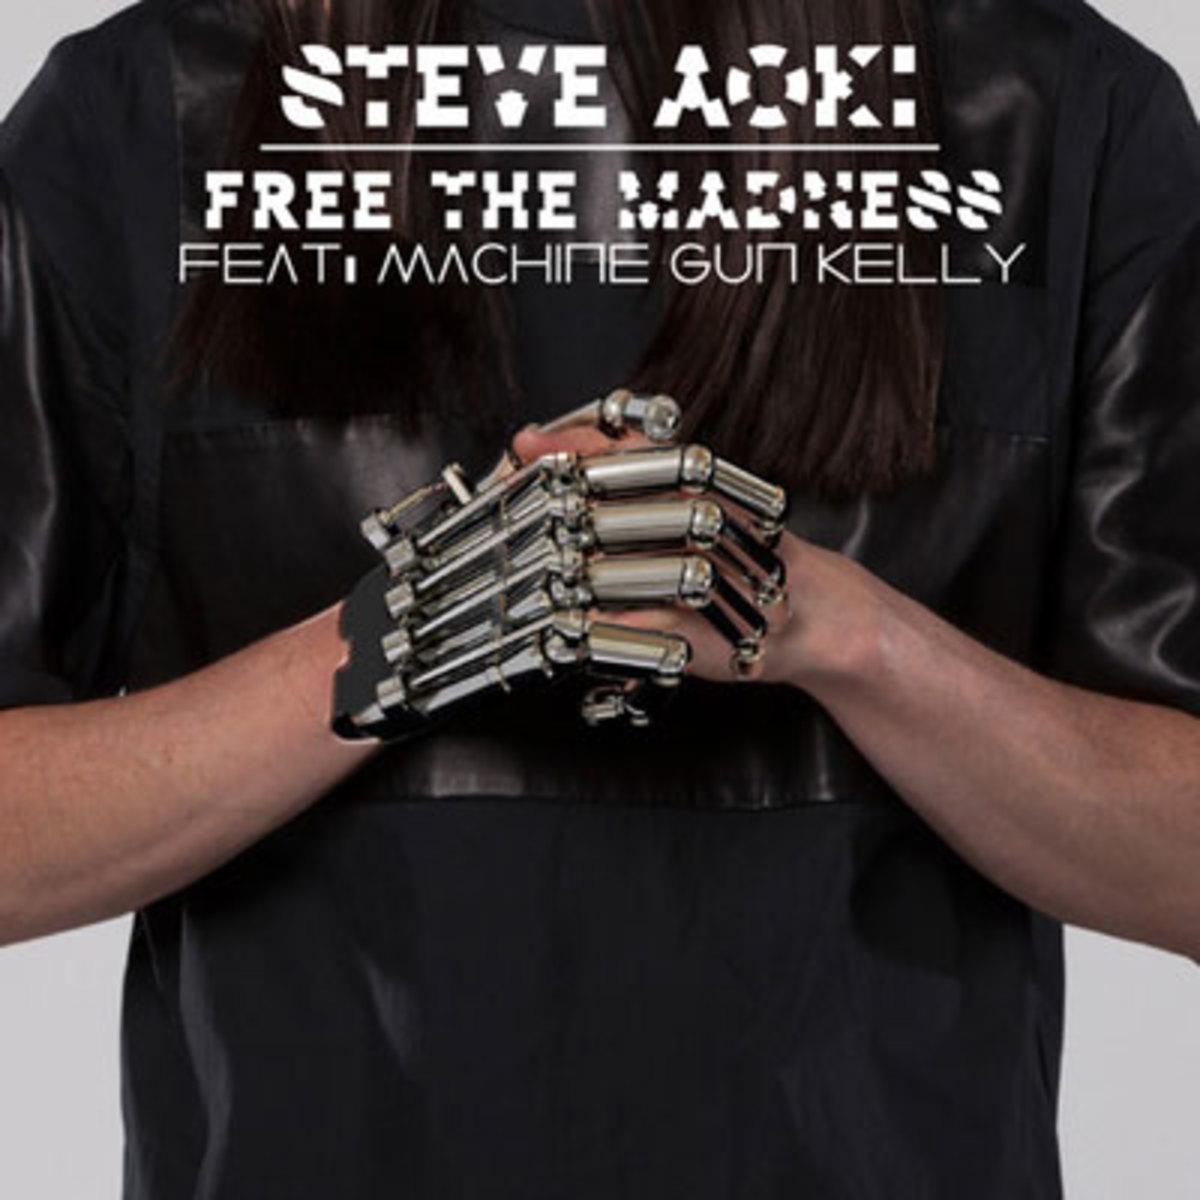 steveaoki-freethemadness.jpg